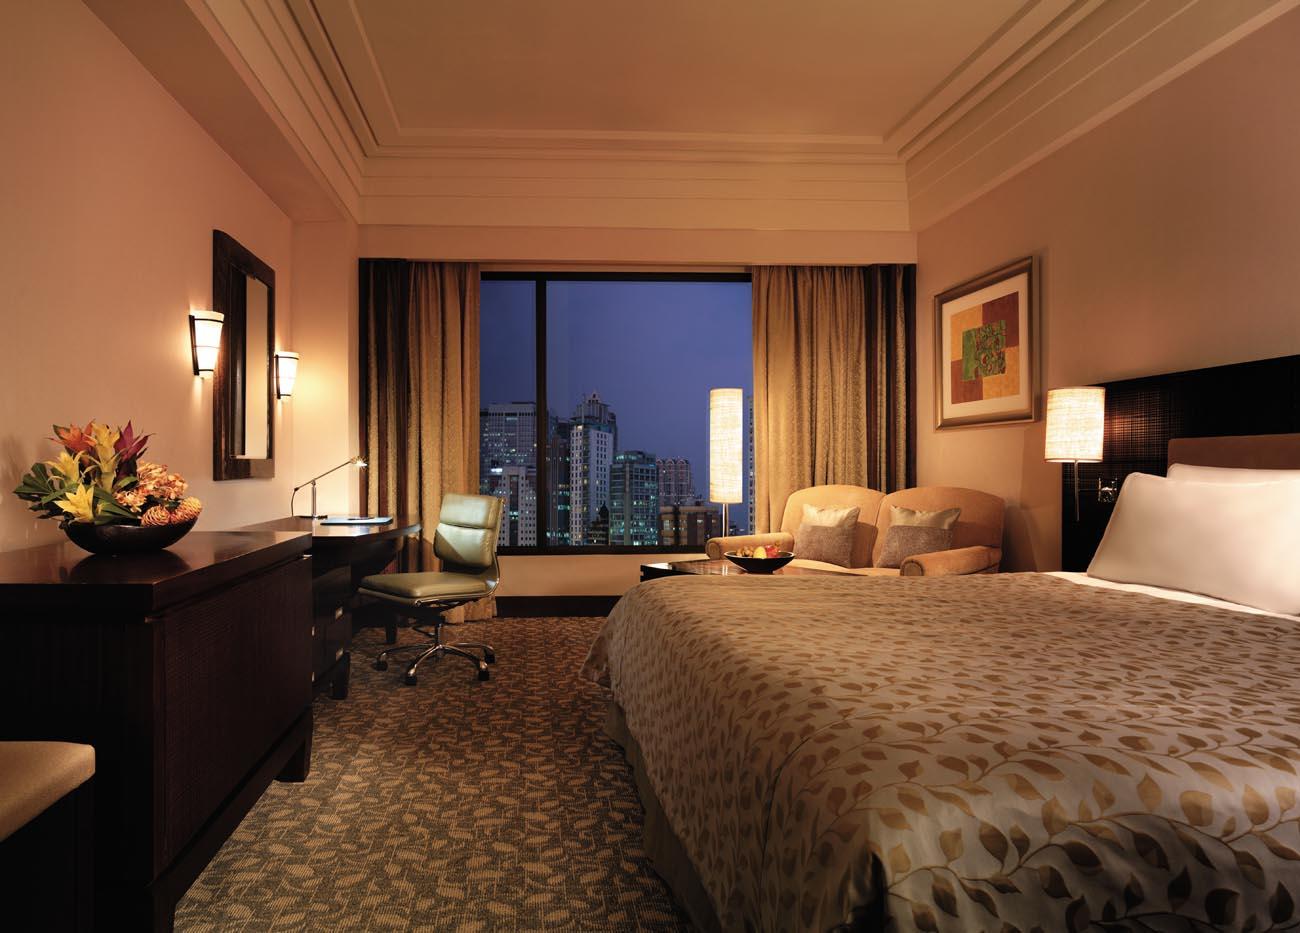 View of your quarantine room at EDSA Shangri-la Hotel